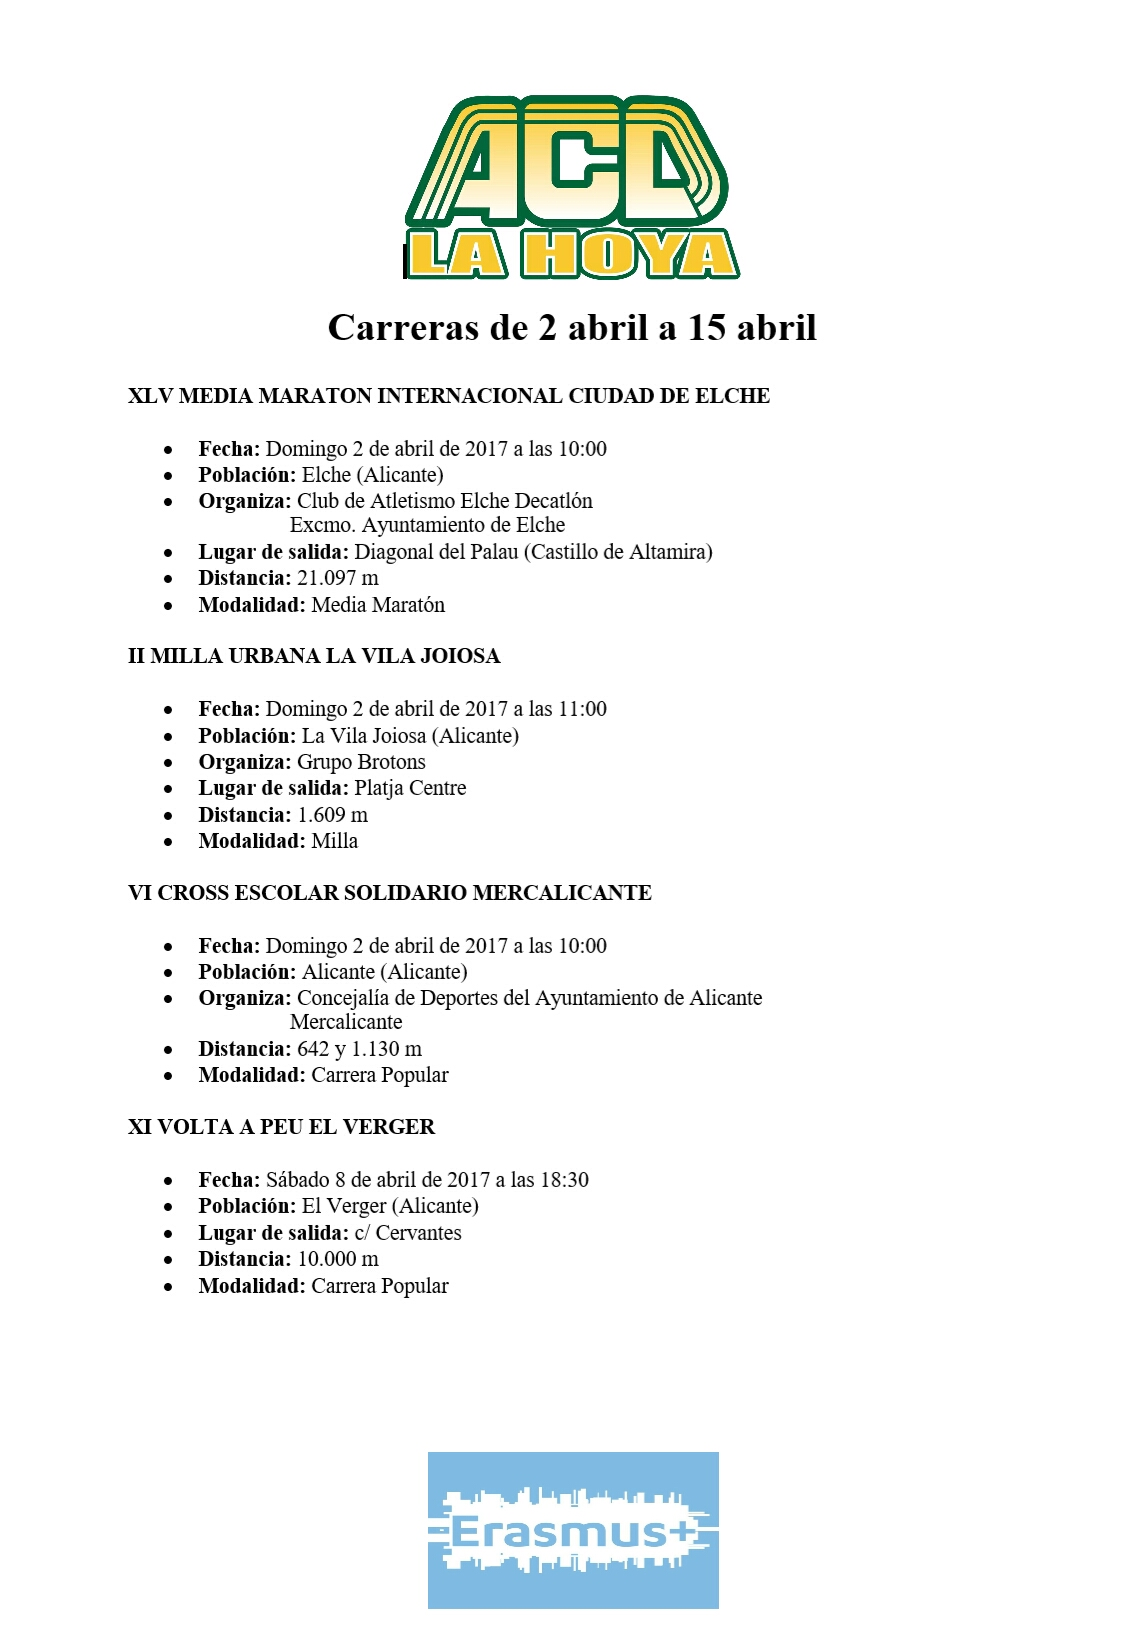 Carreras de 2 – 15 abril (2)